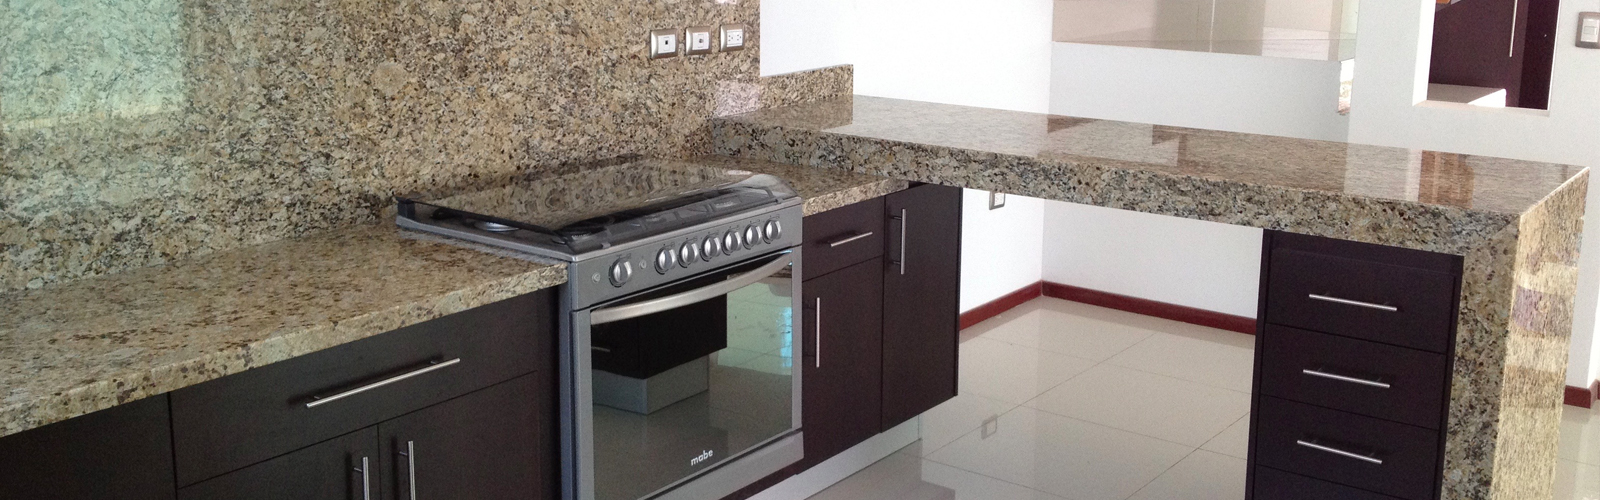 Cocina de granito